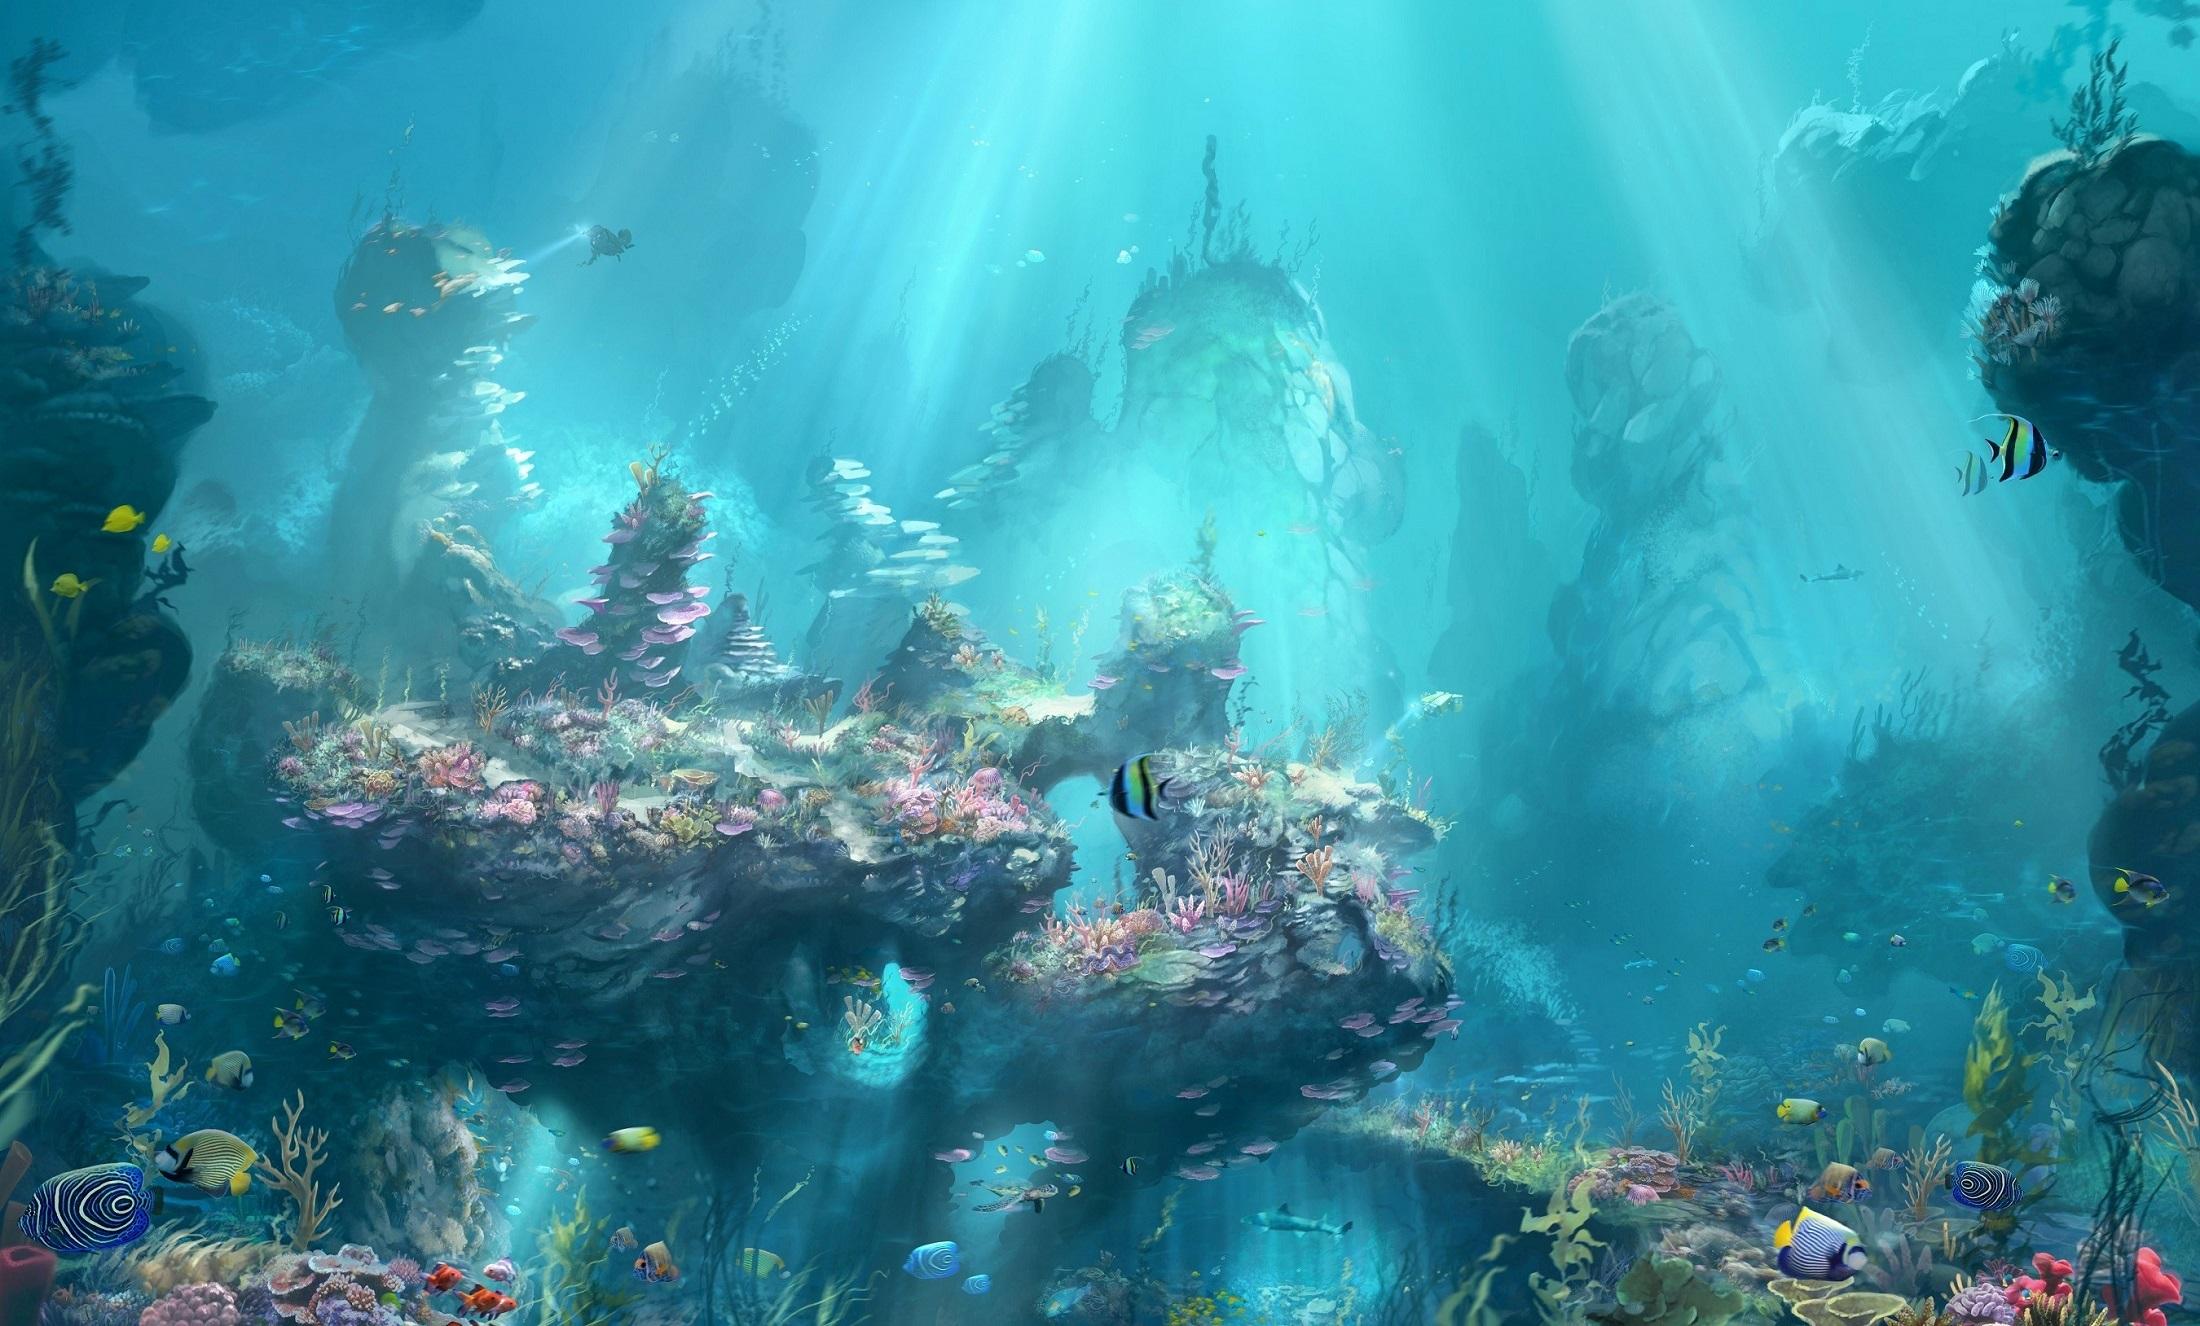 PlayStation VR Worlds Ocean Descent